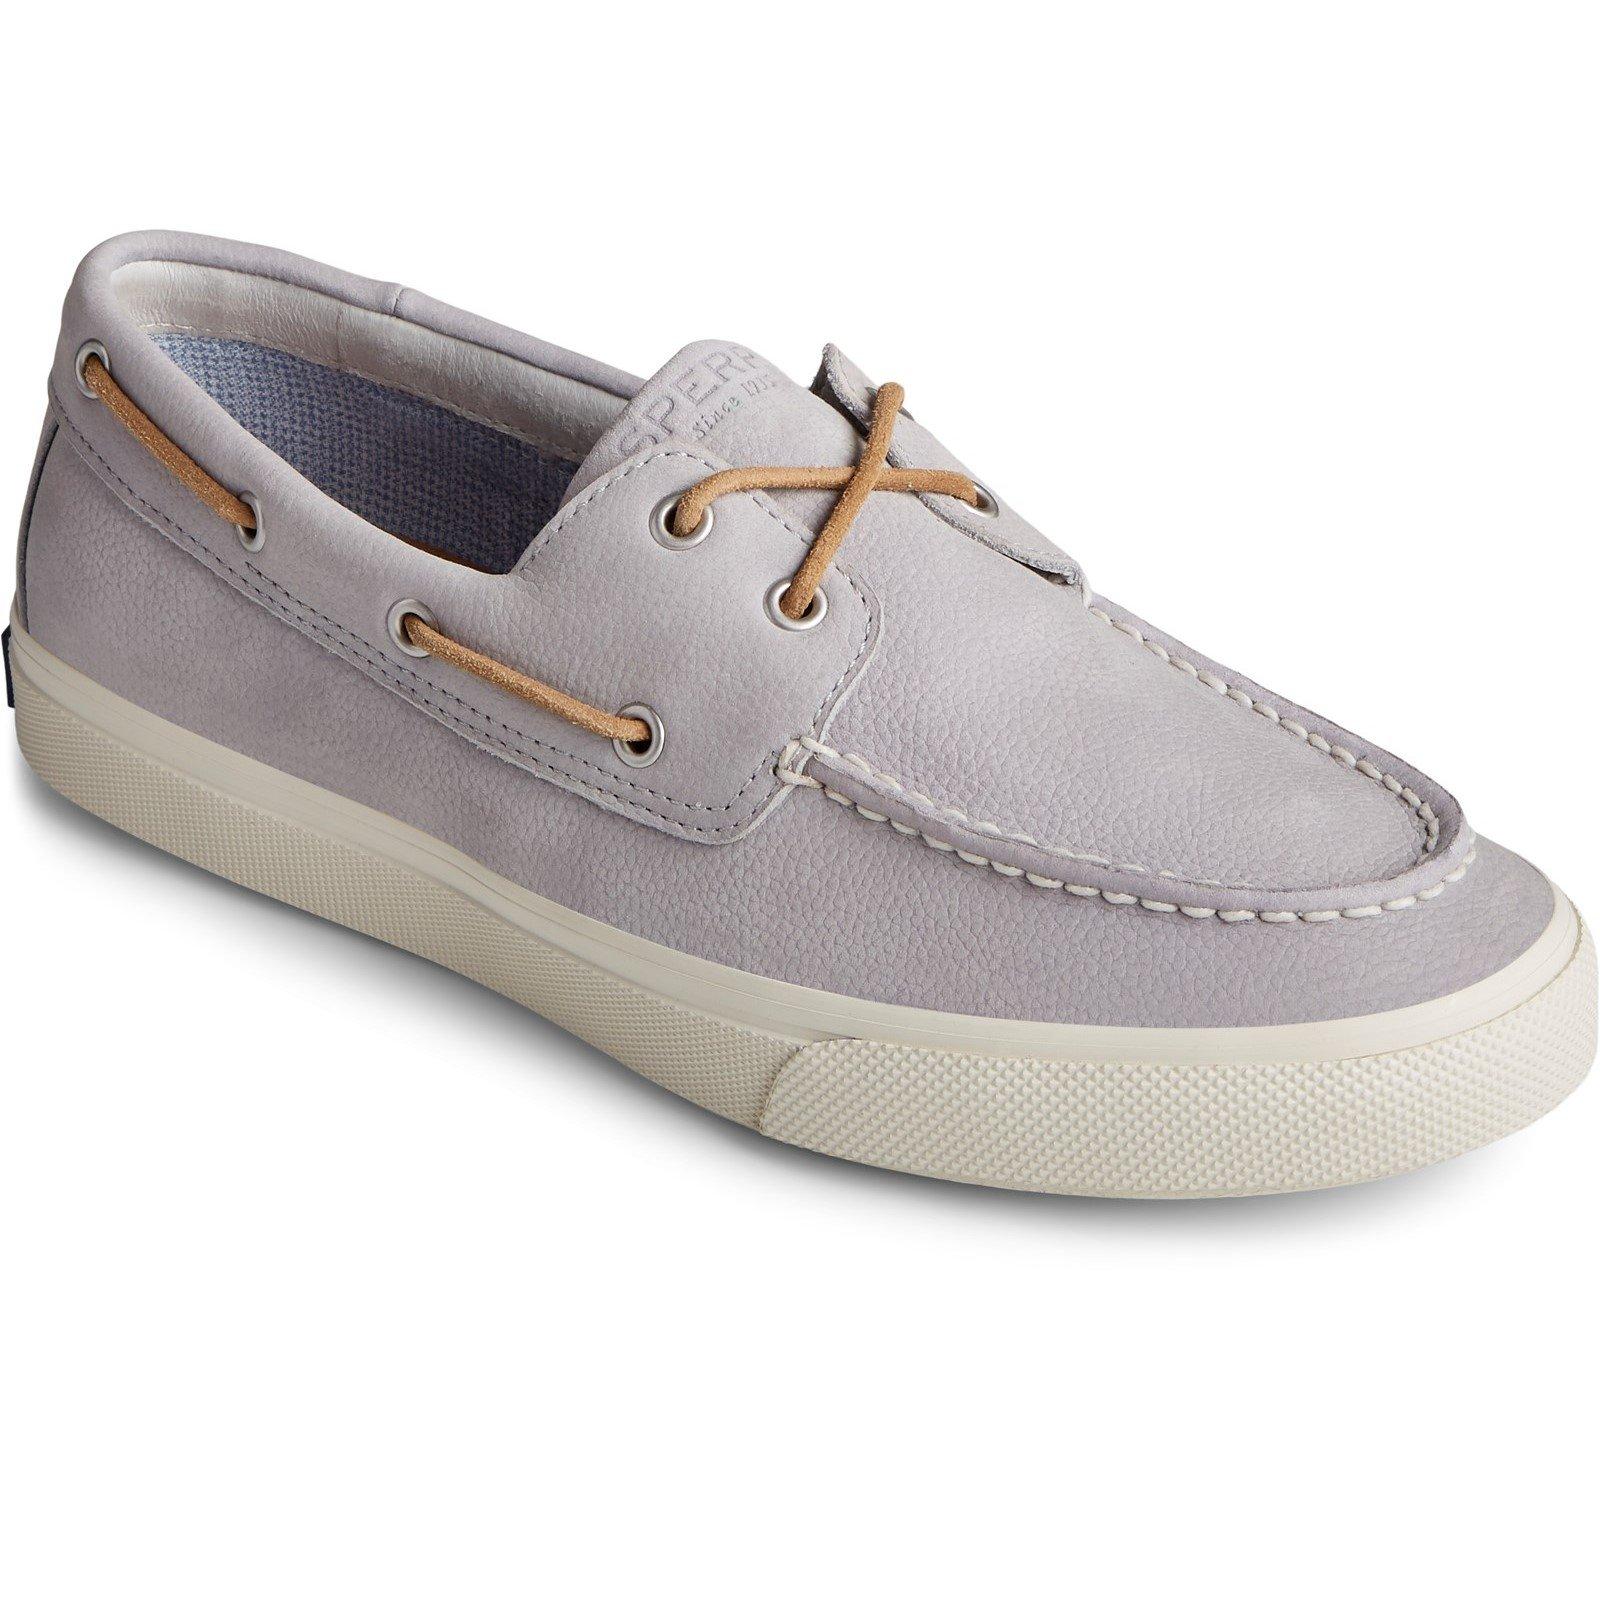 Sperry Men's Bahama Plushwave Boat Shoe Grey 32925 - Grey 7